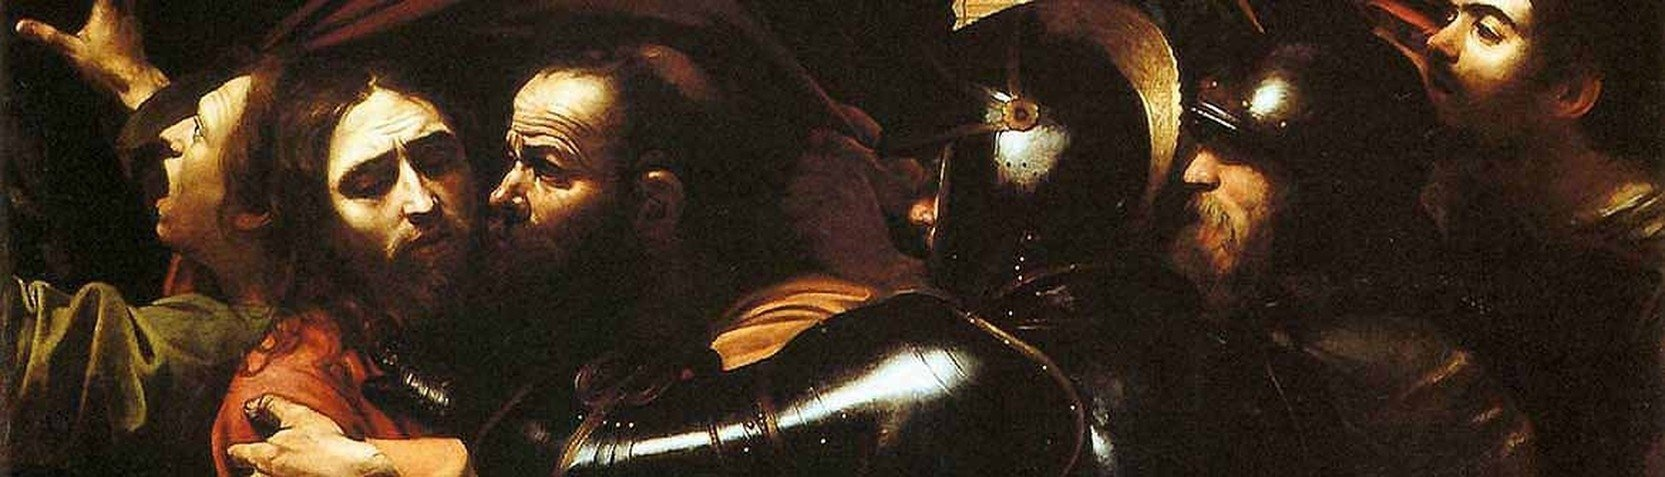 Artistes A-Z - Michelangelo Caravaggio